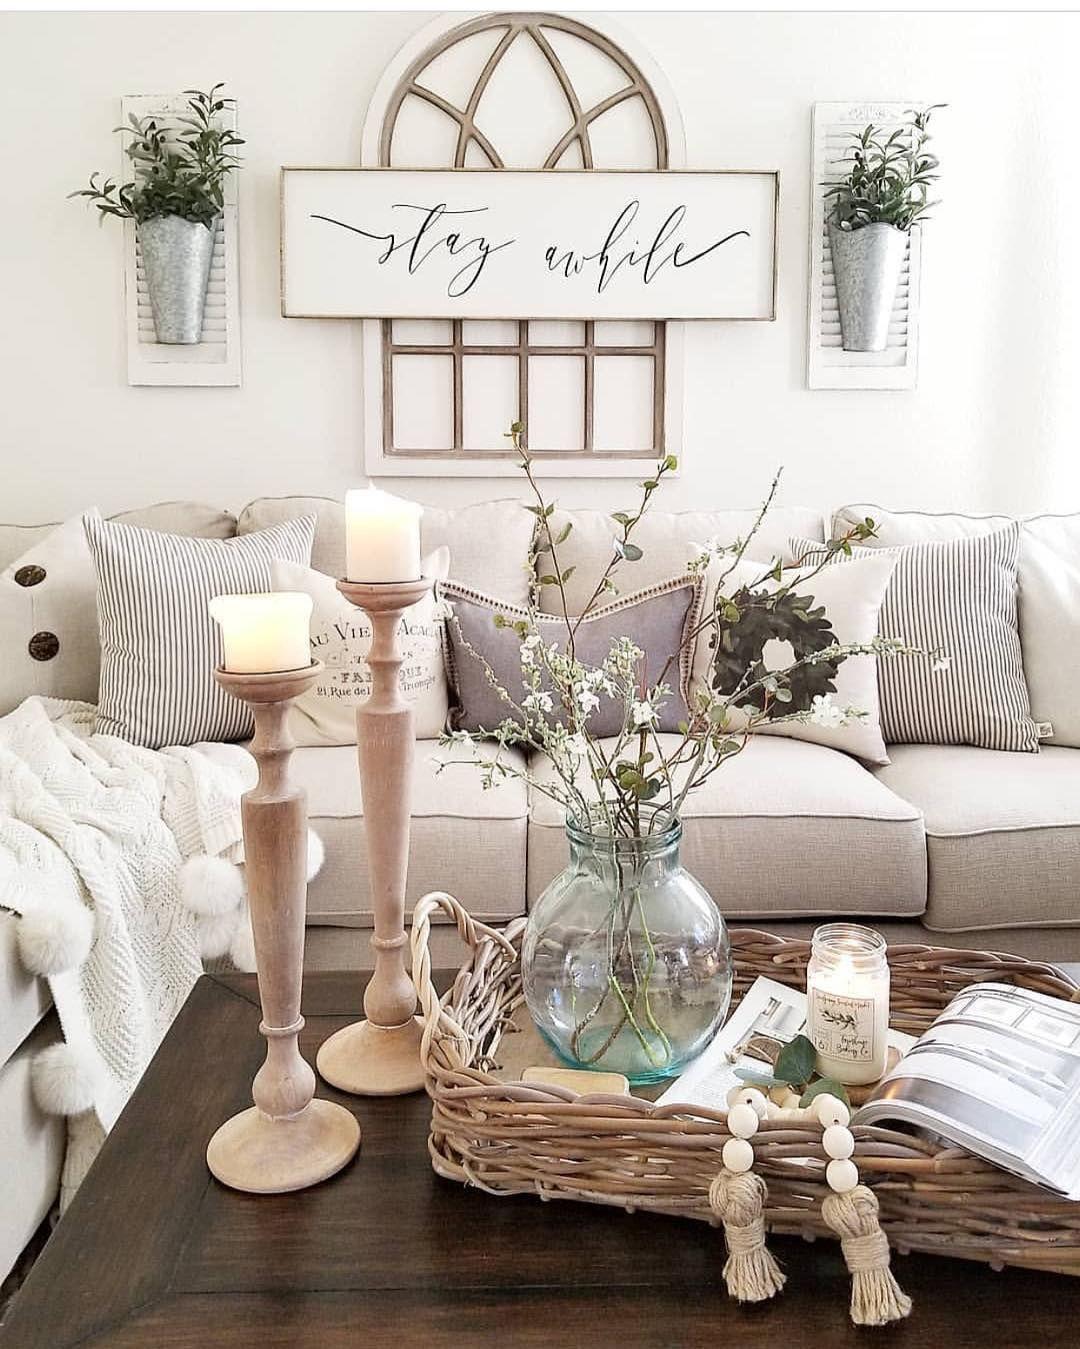 Living room | Farmhouse decor living room, Farm house ...